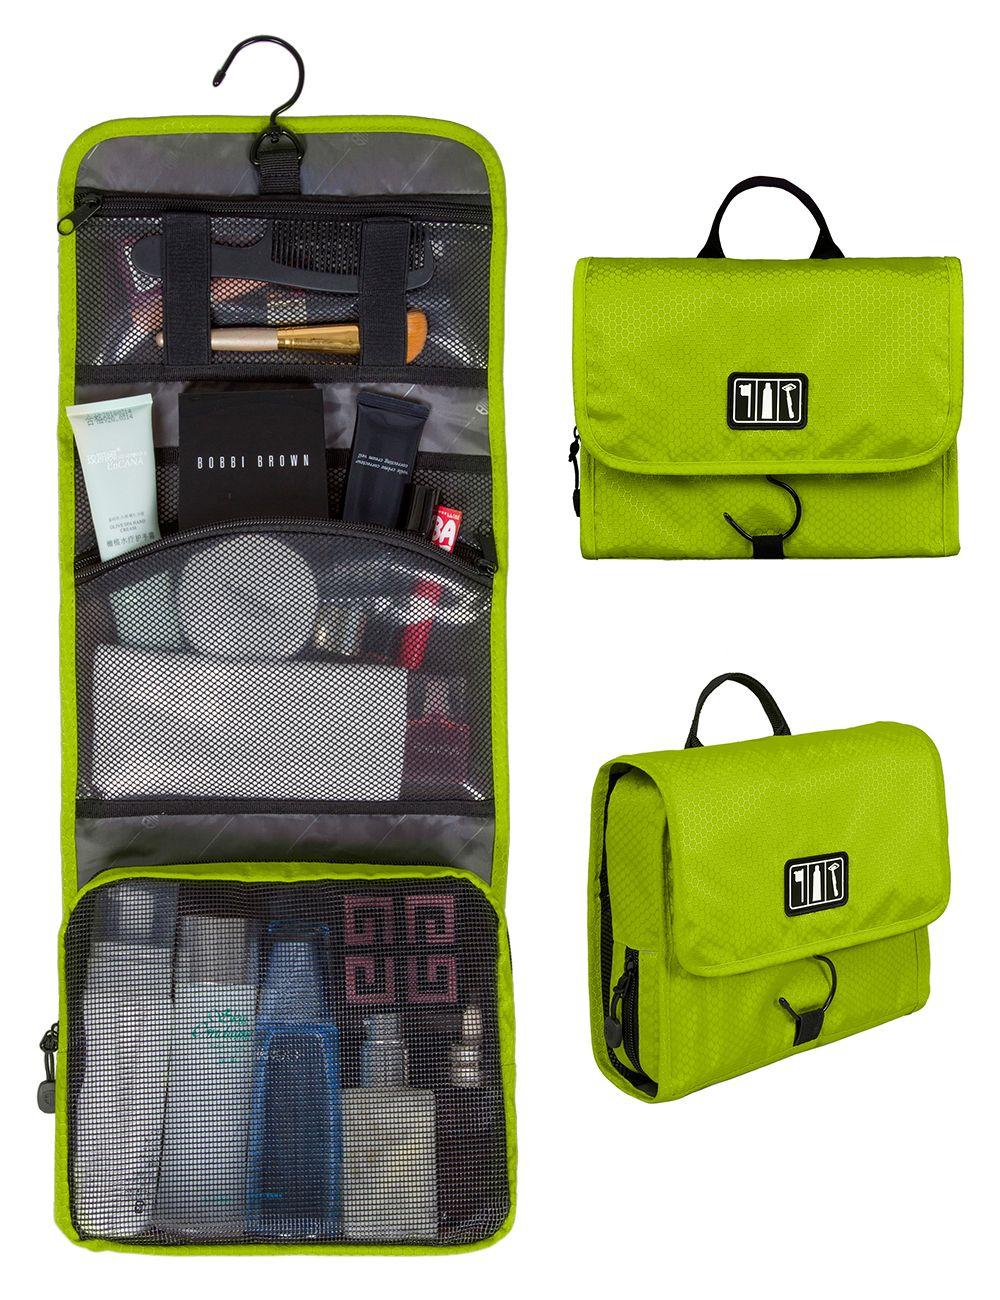 1f0068012cc26e TOURIT Waterproof Cosmetic Bag Large Women Travel Toiletry Makeup Bag  Storage Wash handBag Multifunctional Organizer travel bag